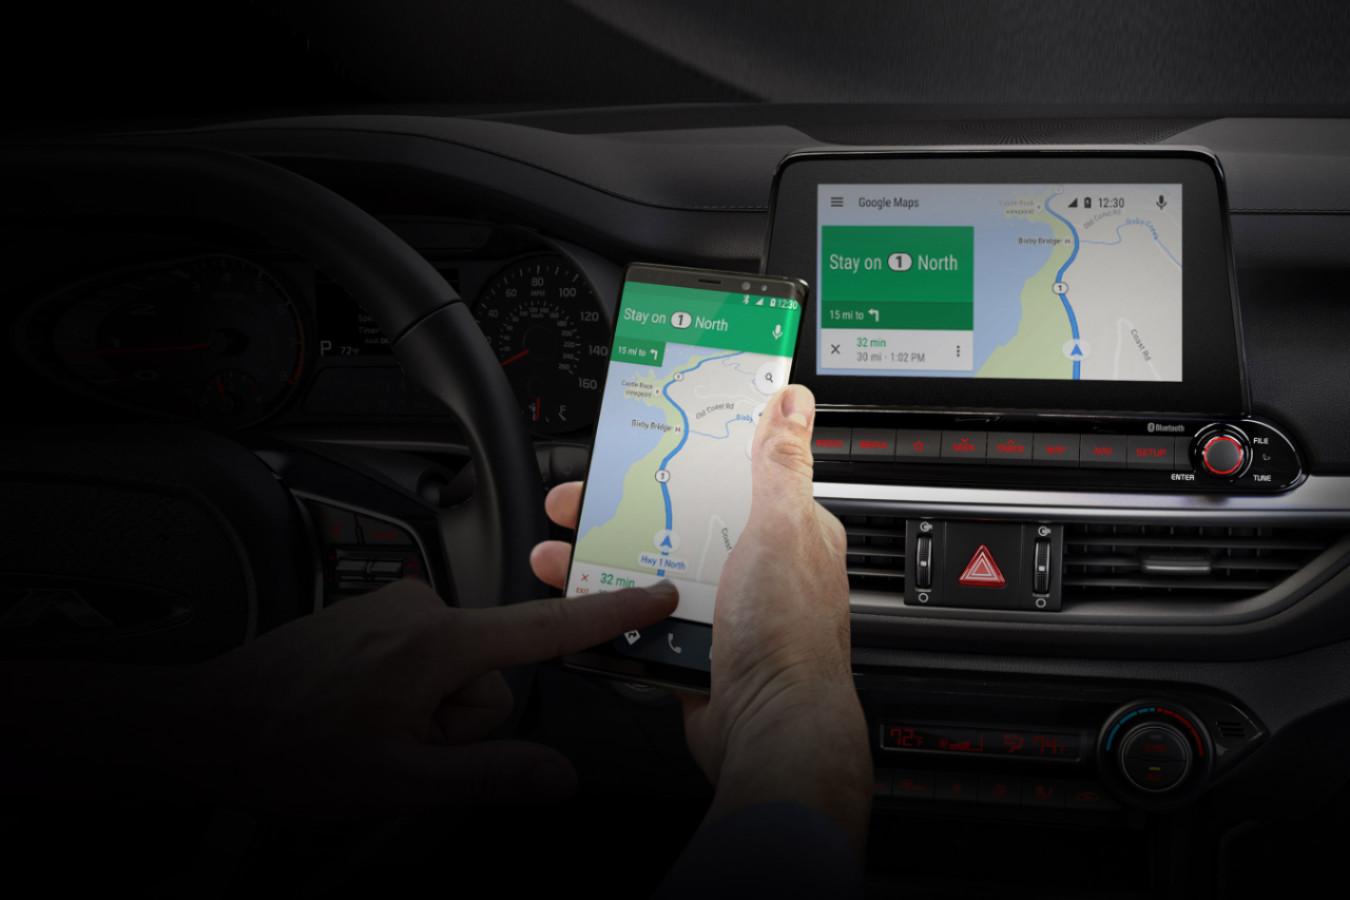 2020 Kia Forte Navigation Technology